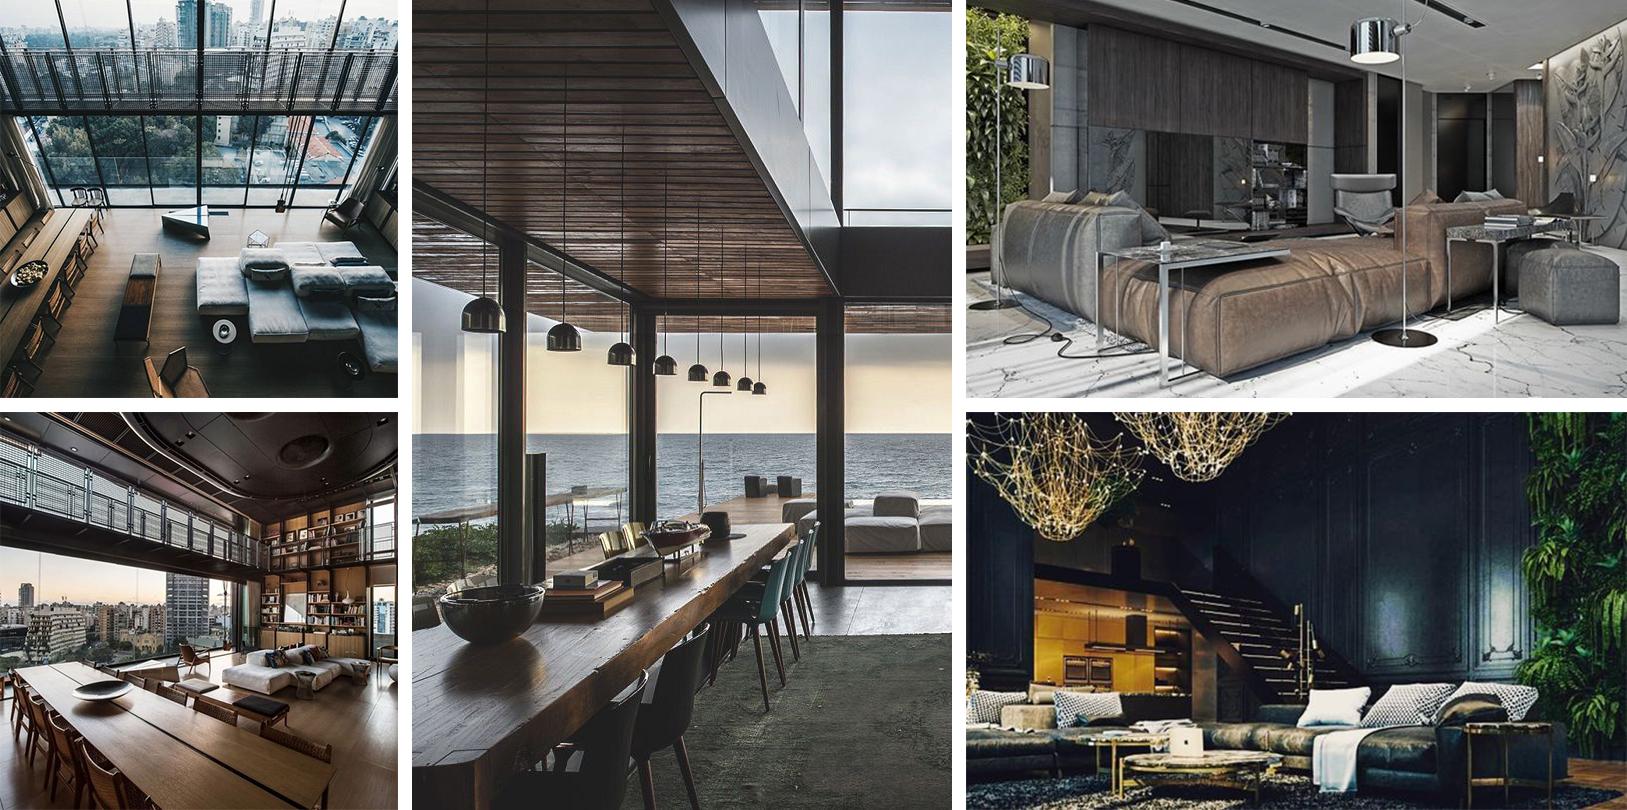 Interior Design Imagery for Photoreal 3D Walkthrough